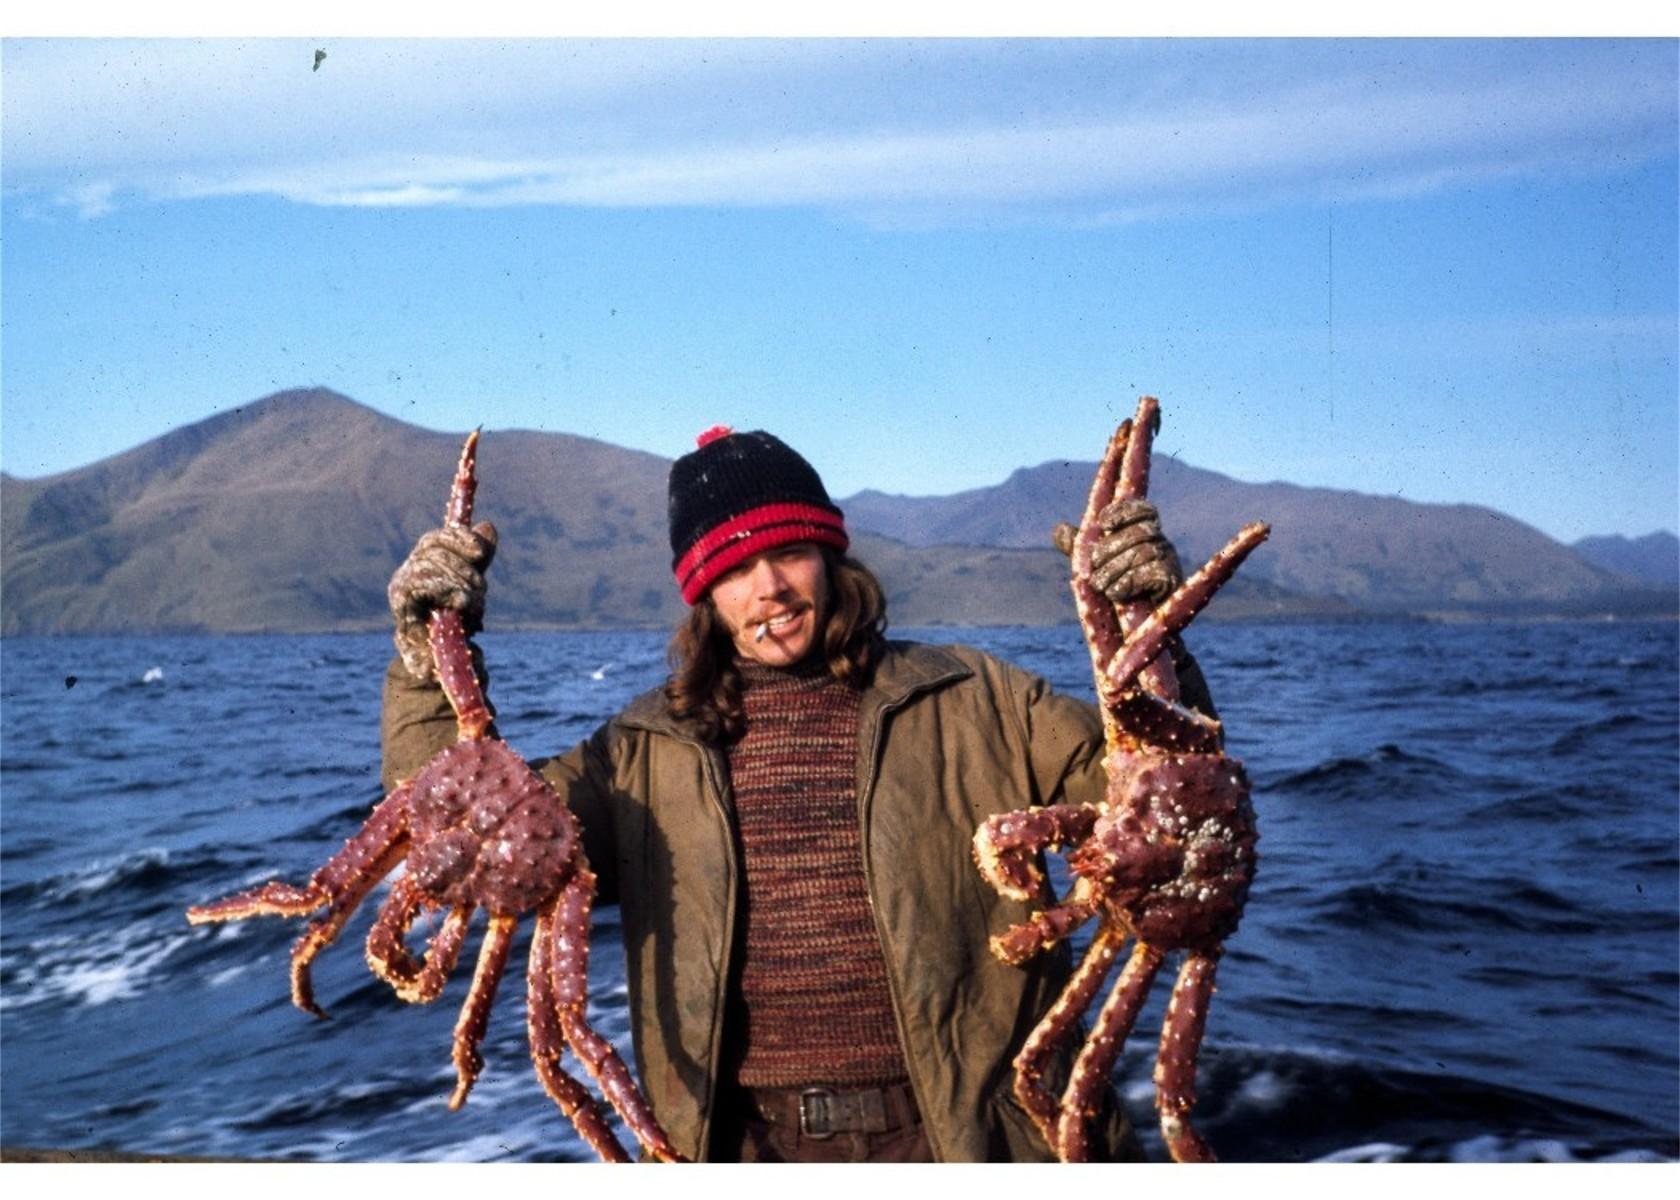 Early in my fishing career catching Kodiak King Crab